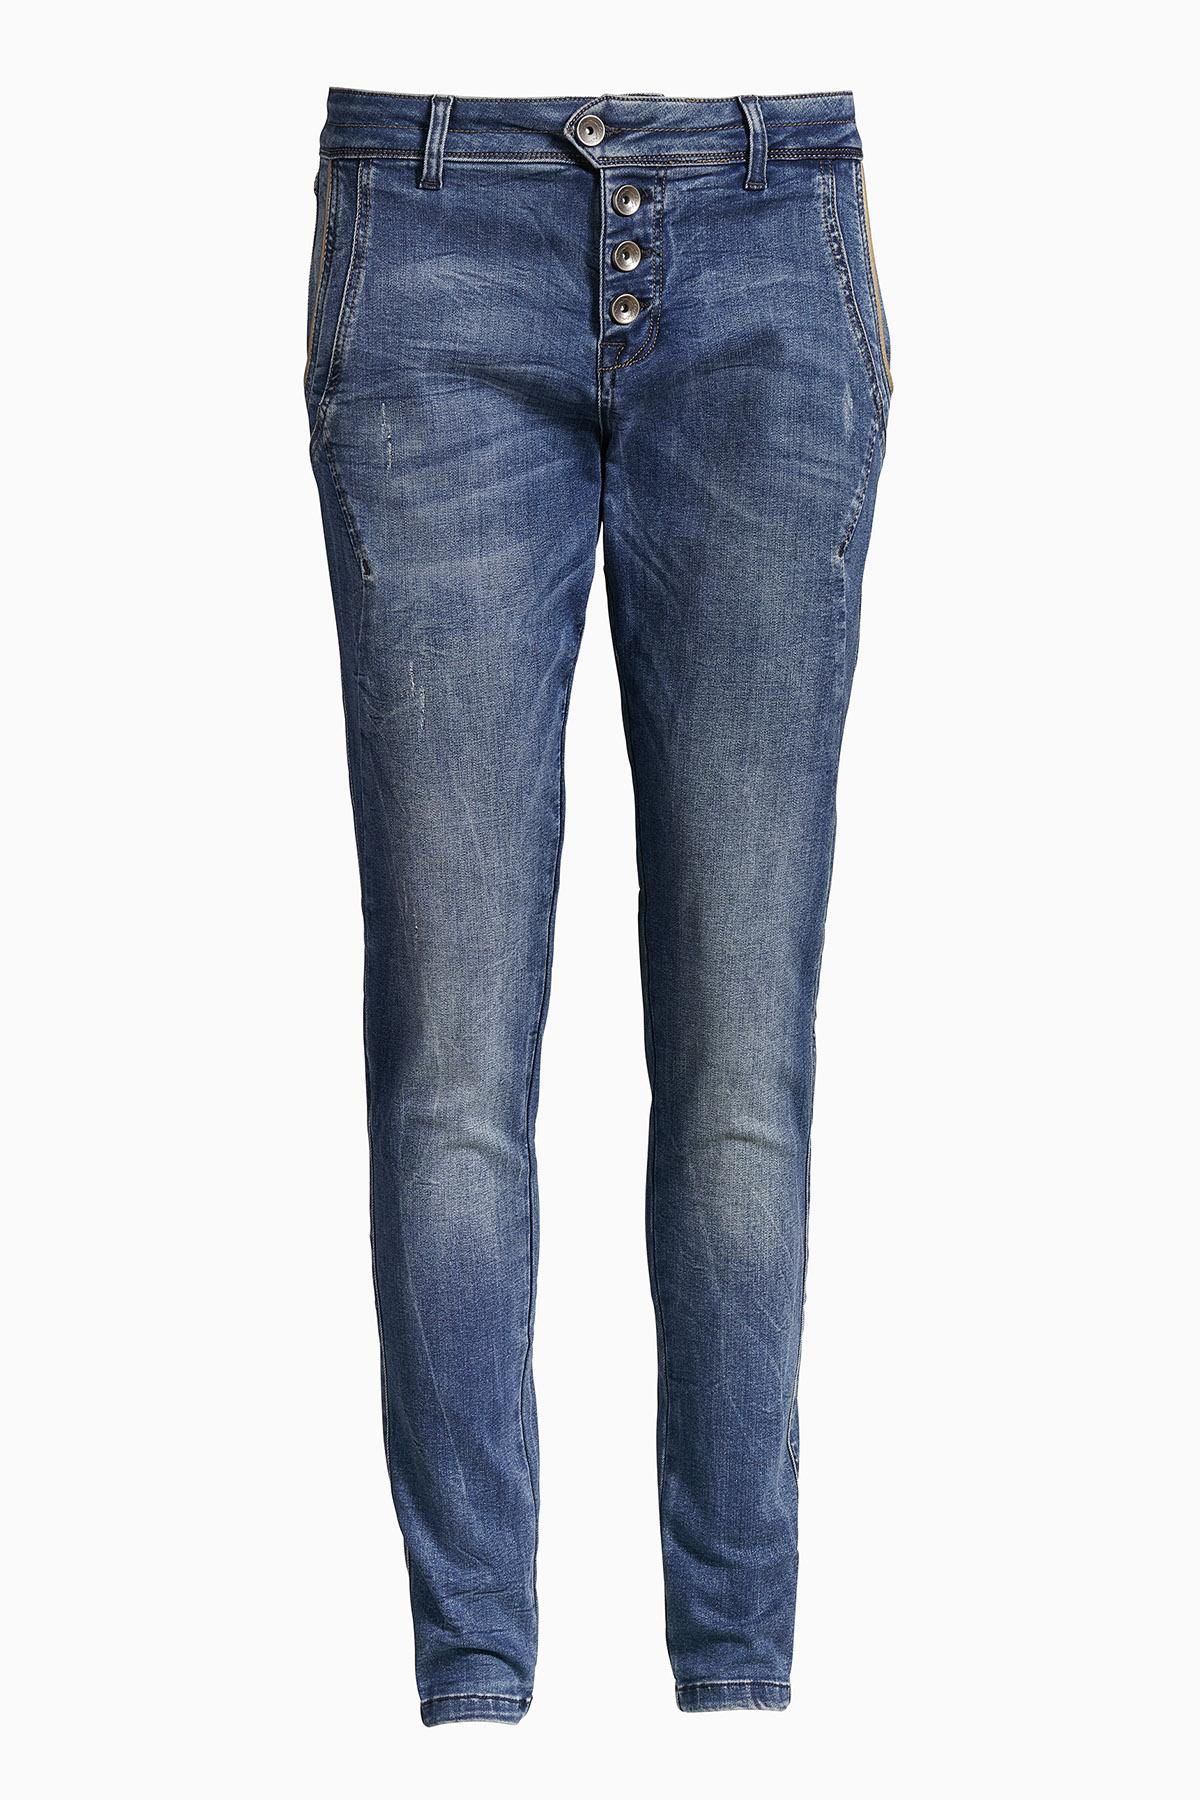 Image of Cream Dame Jeans - Denimblå